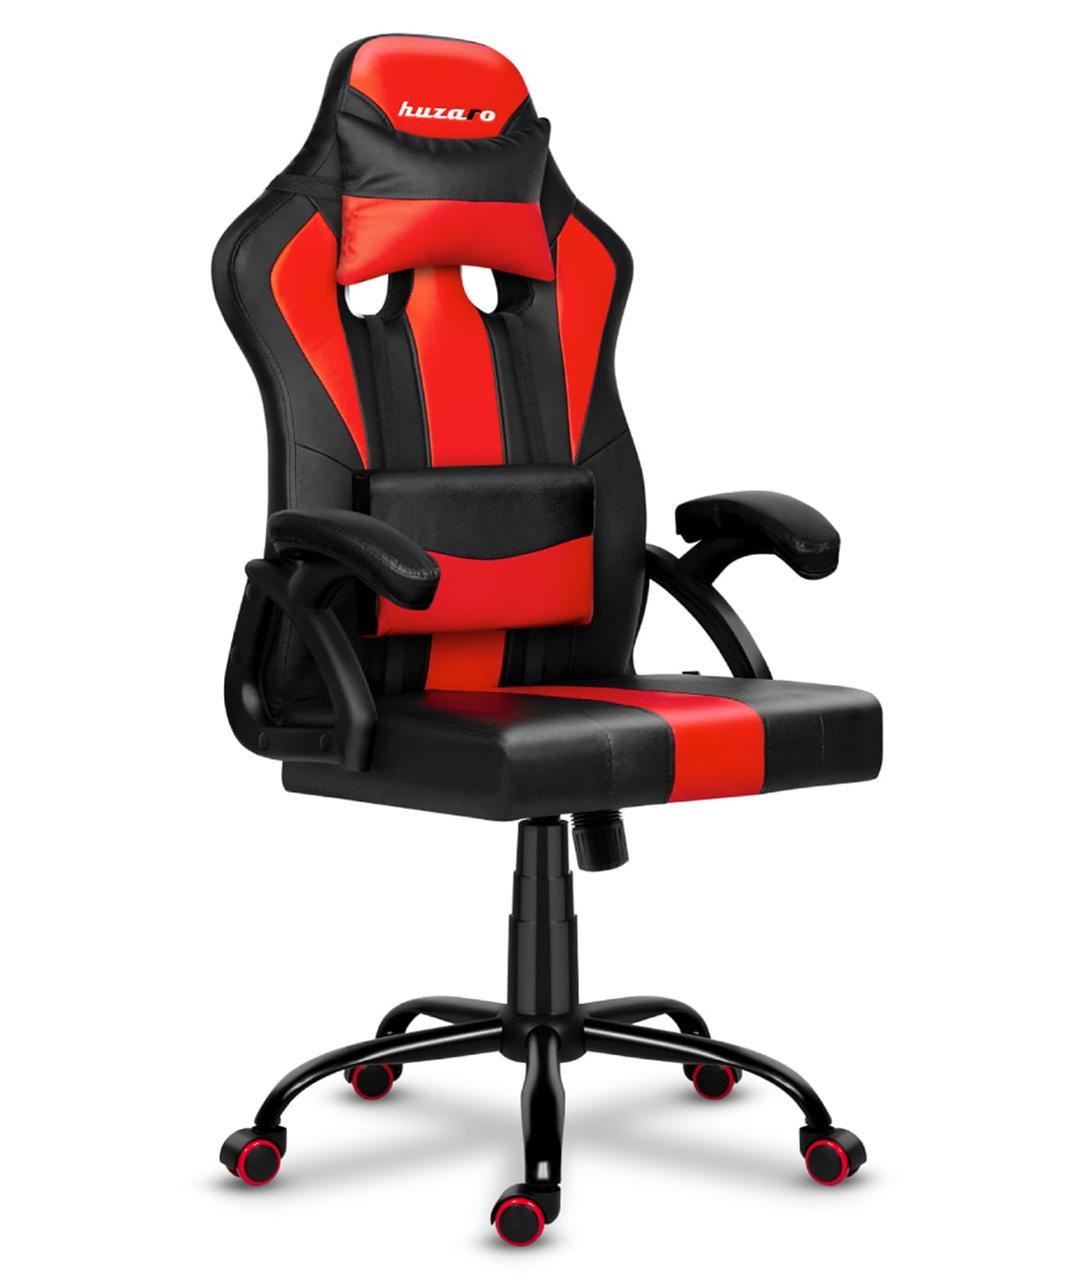 Игровое кресло HUZARO FORCE 3.0